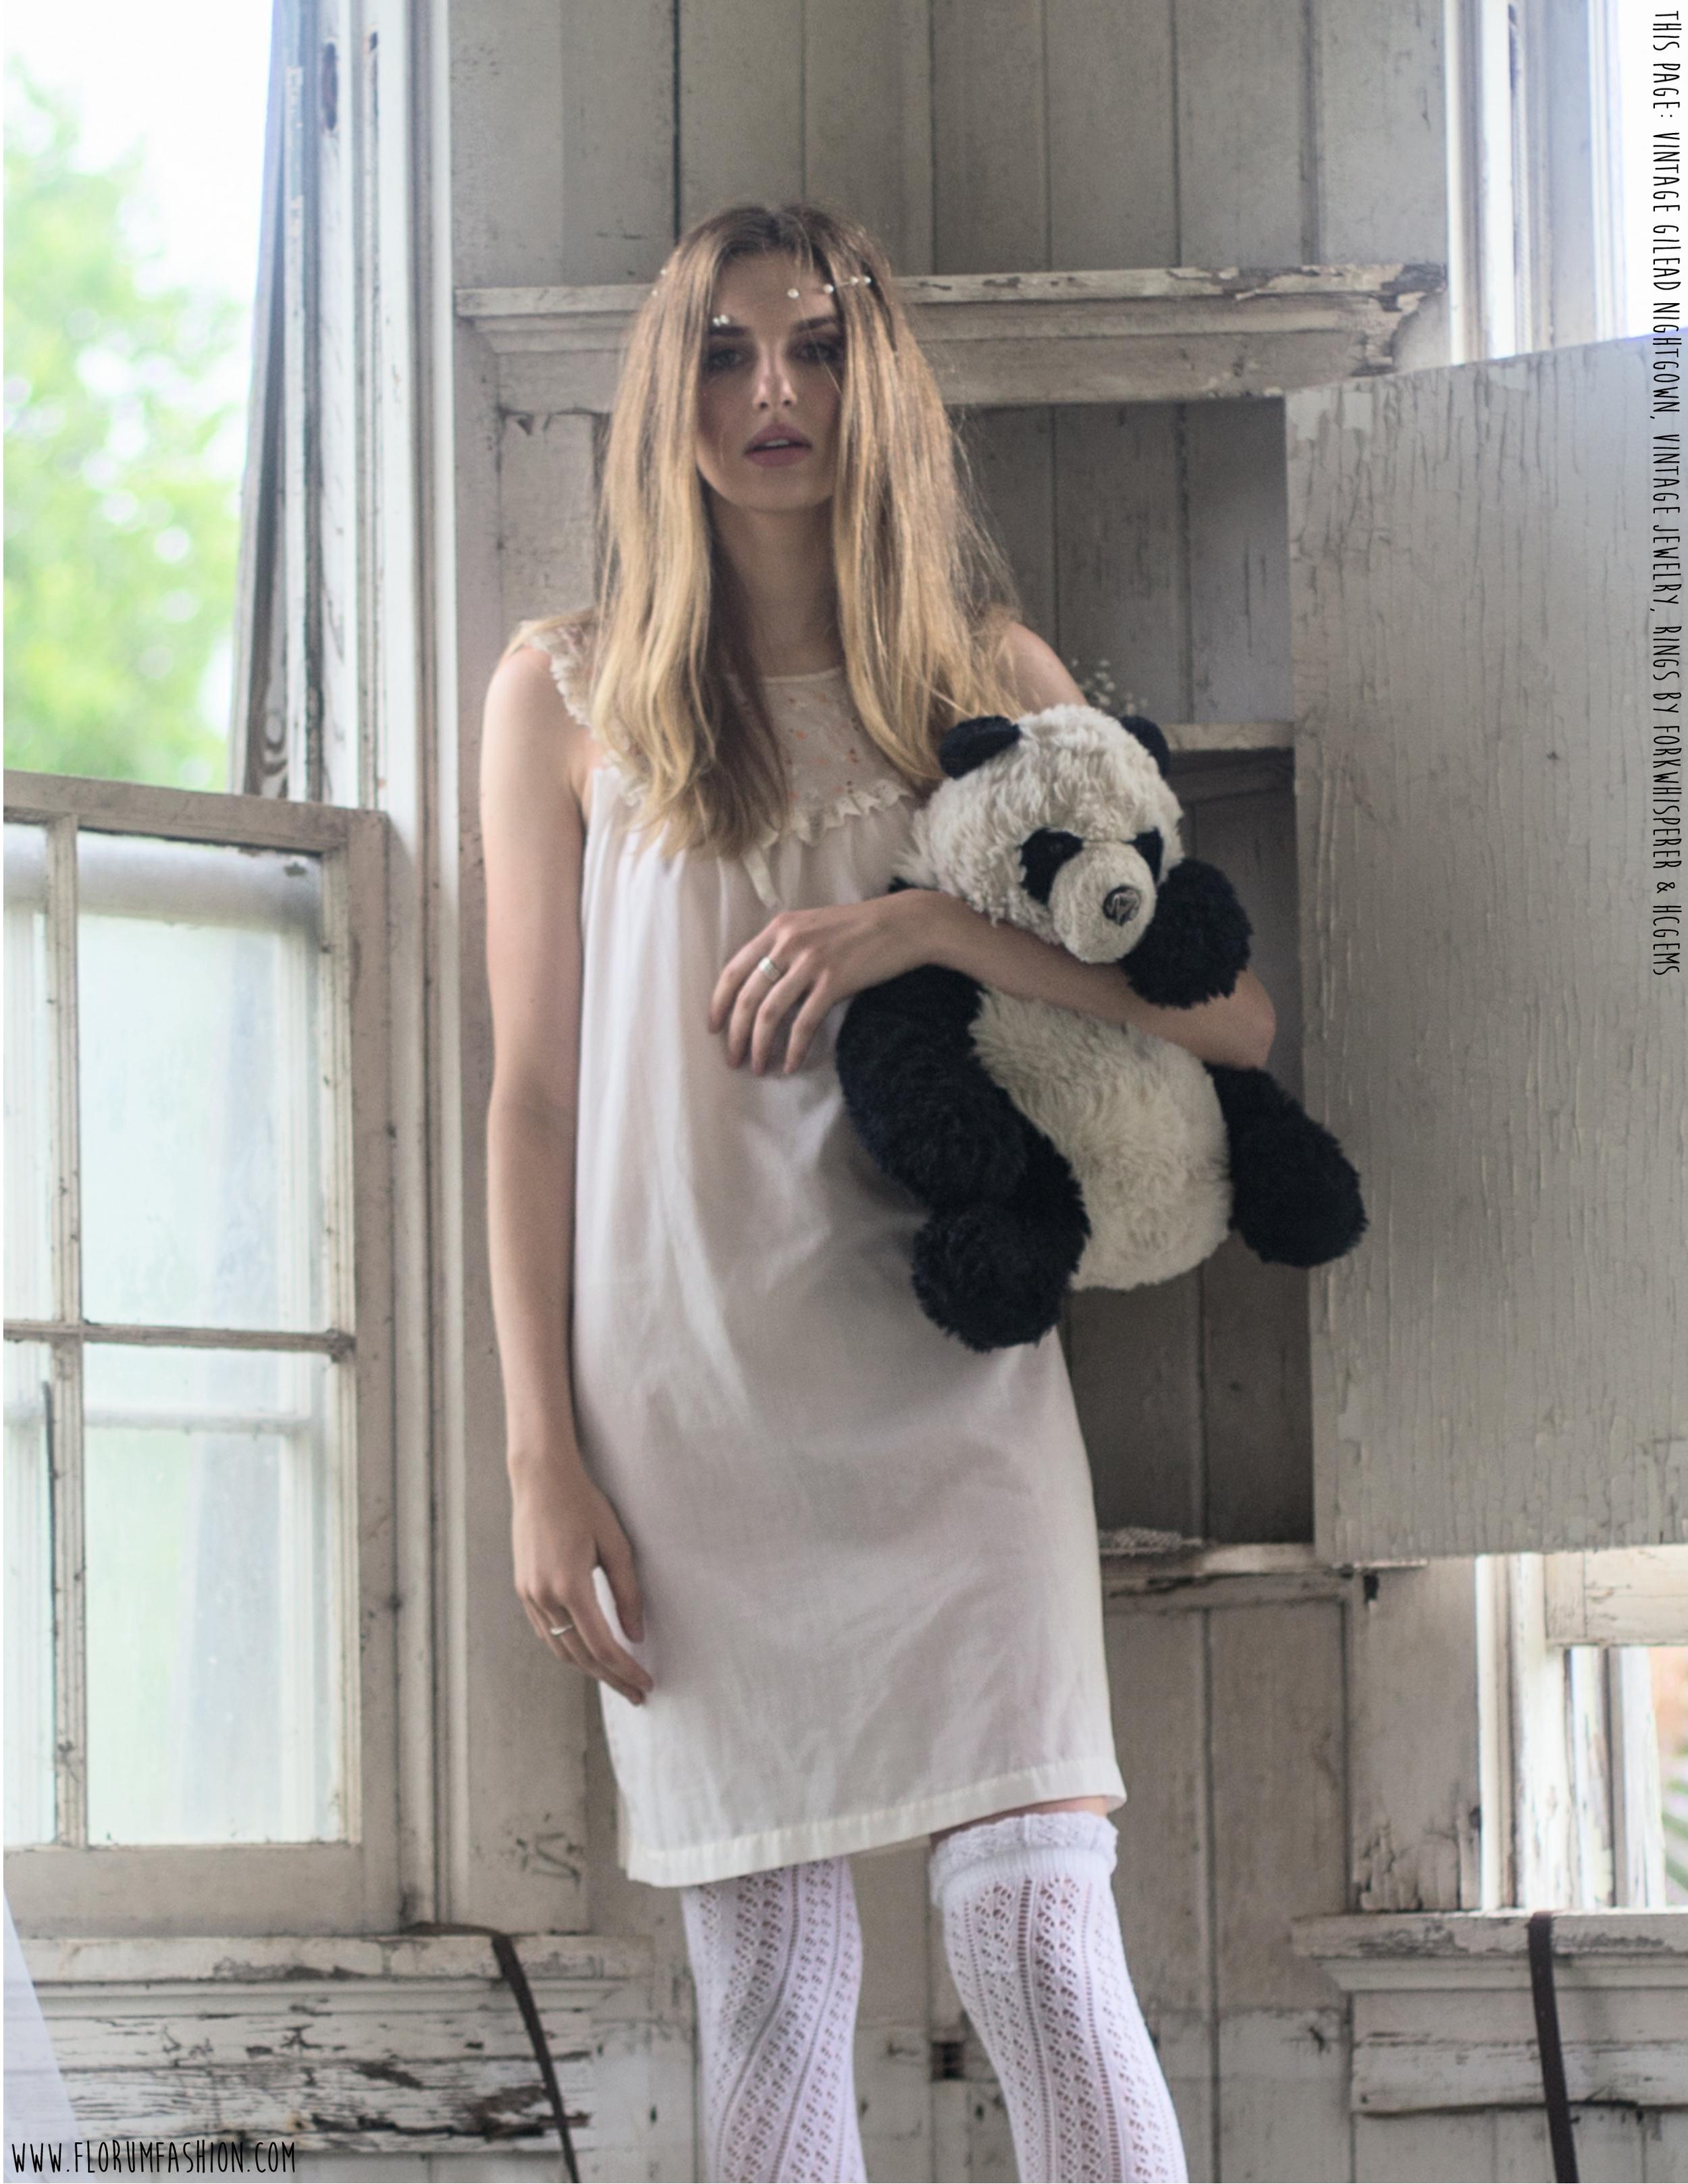 Vintage Dreams - Florum Fashion Magazine - Slow Fashion Movement - Monique Rodriguez - Grace Paulter - Urban Model Milano - Callidus Agency Dallas - Janelle Baughn - Tara Bernal Cipres